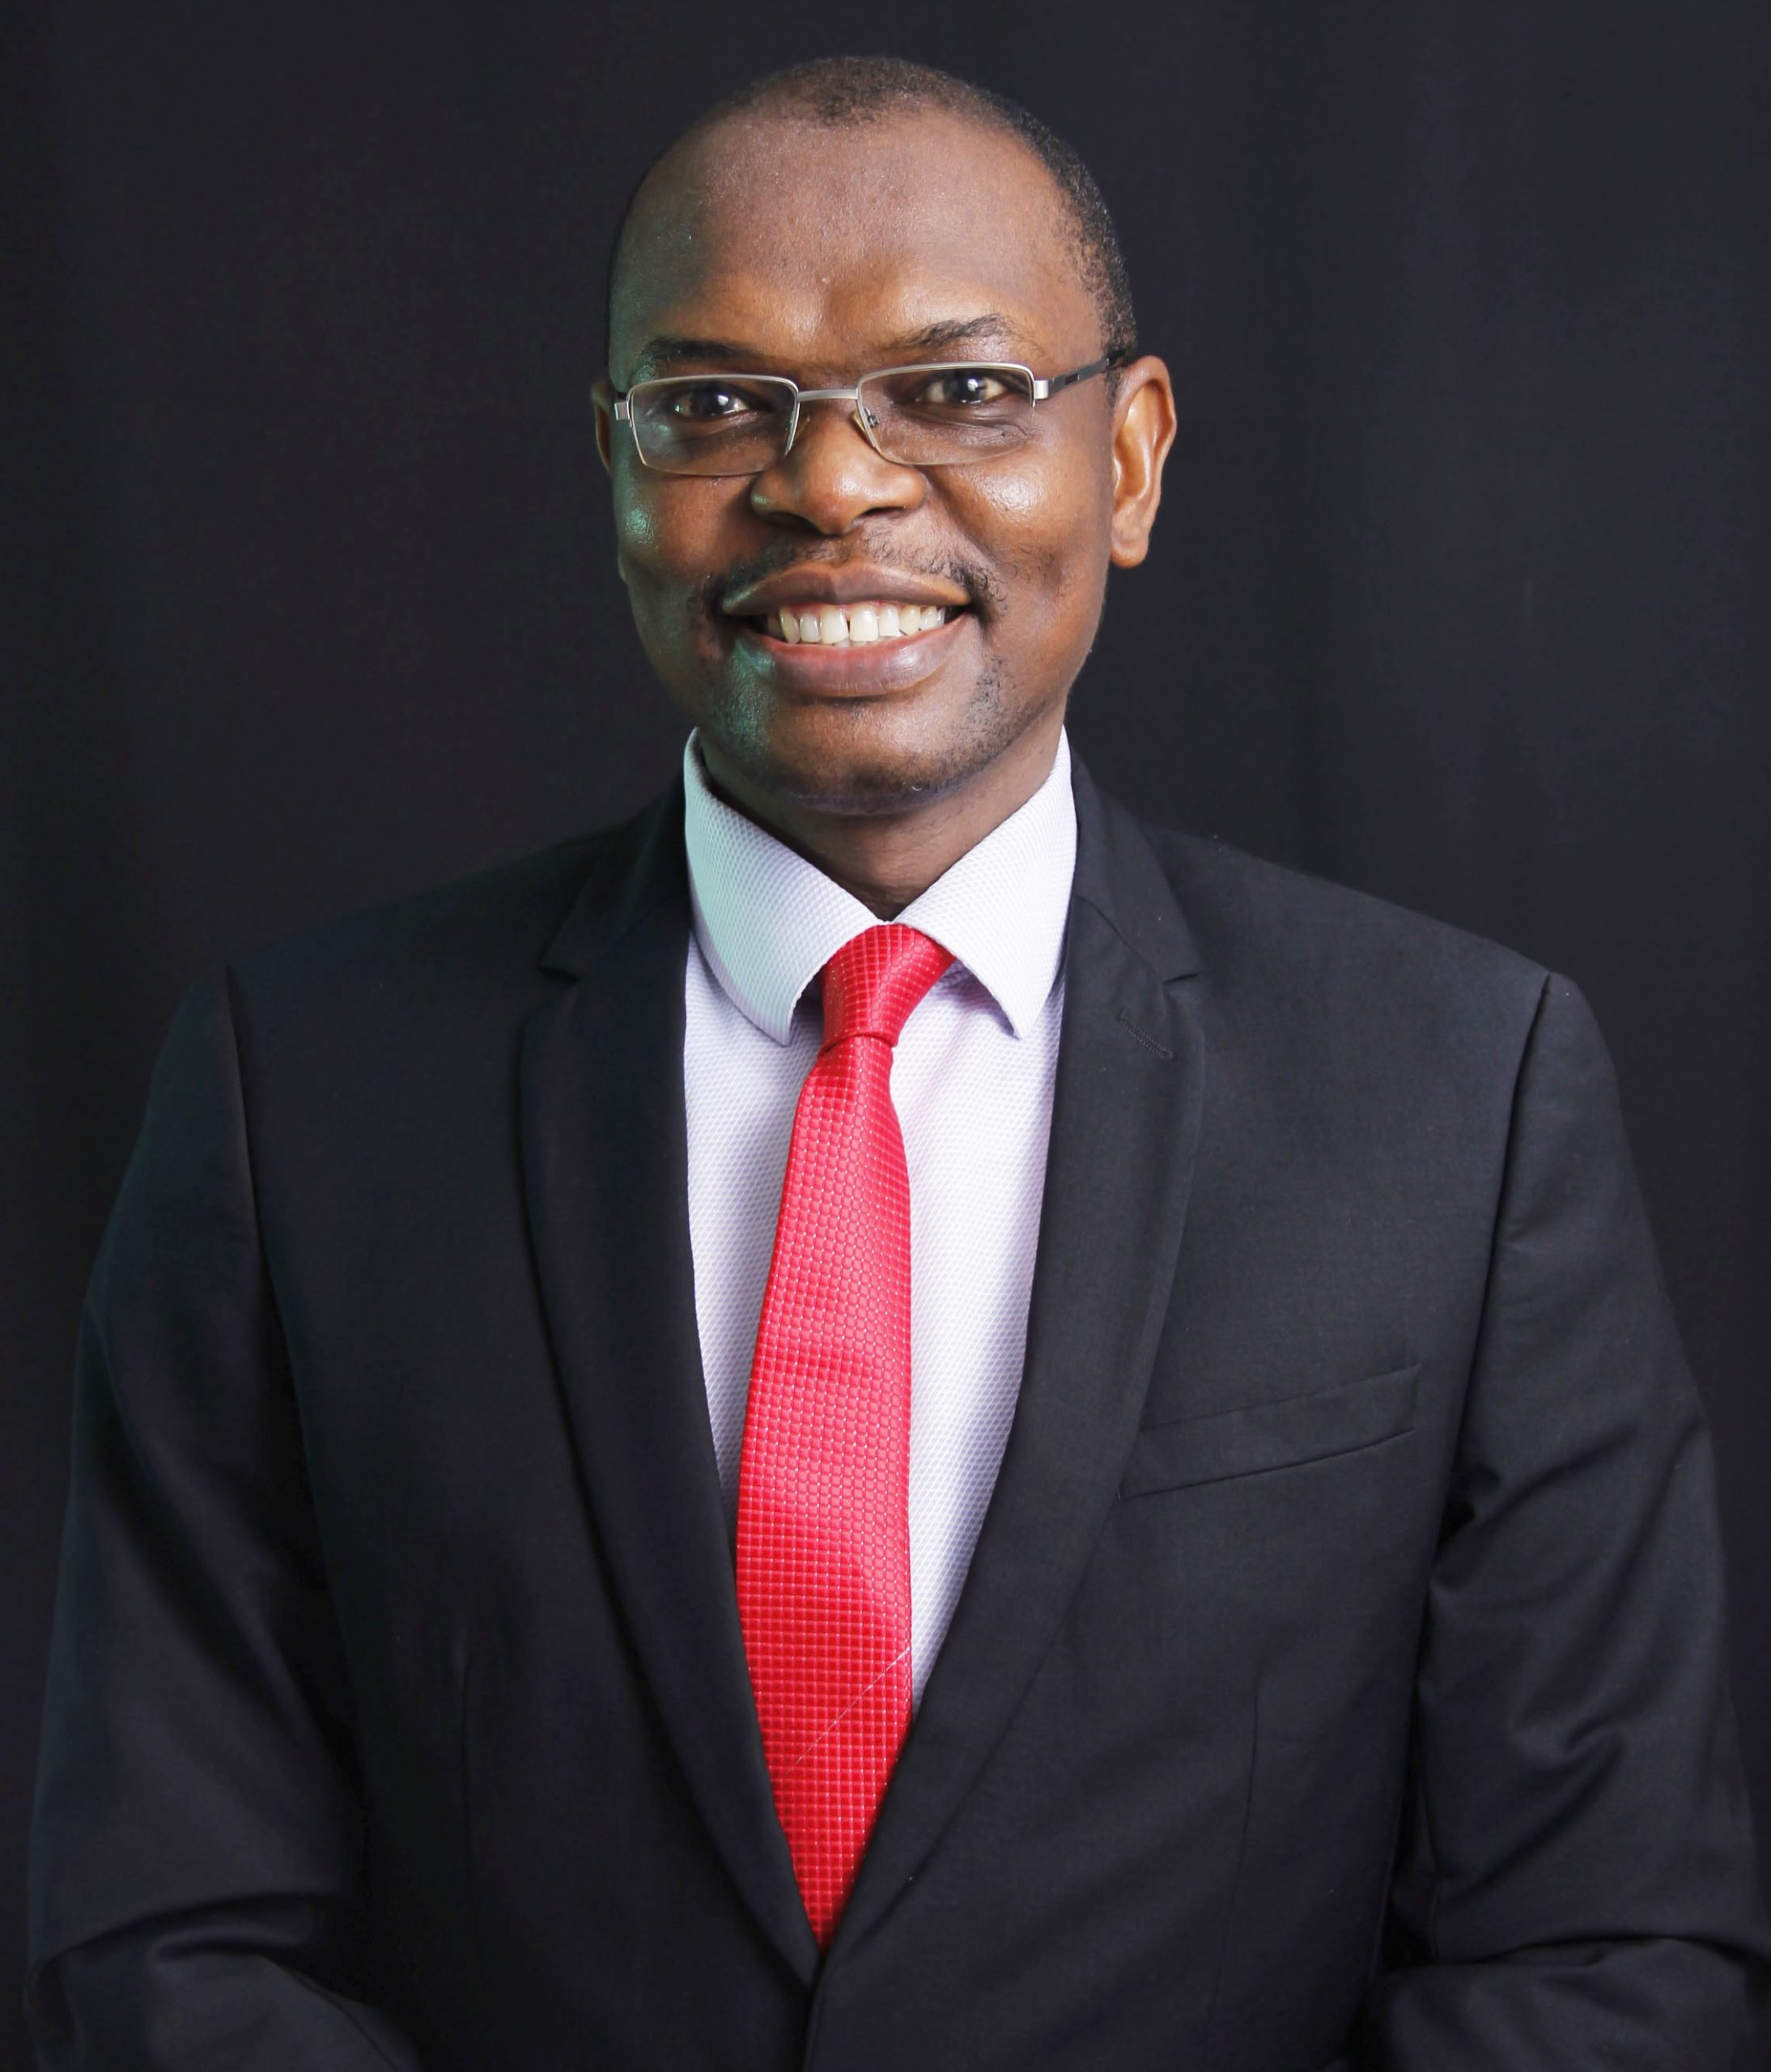 Nnamdi Ndu CEO CHINI Africa scaled